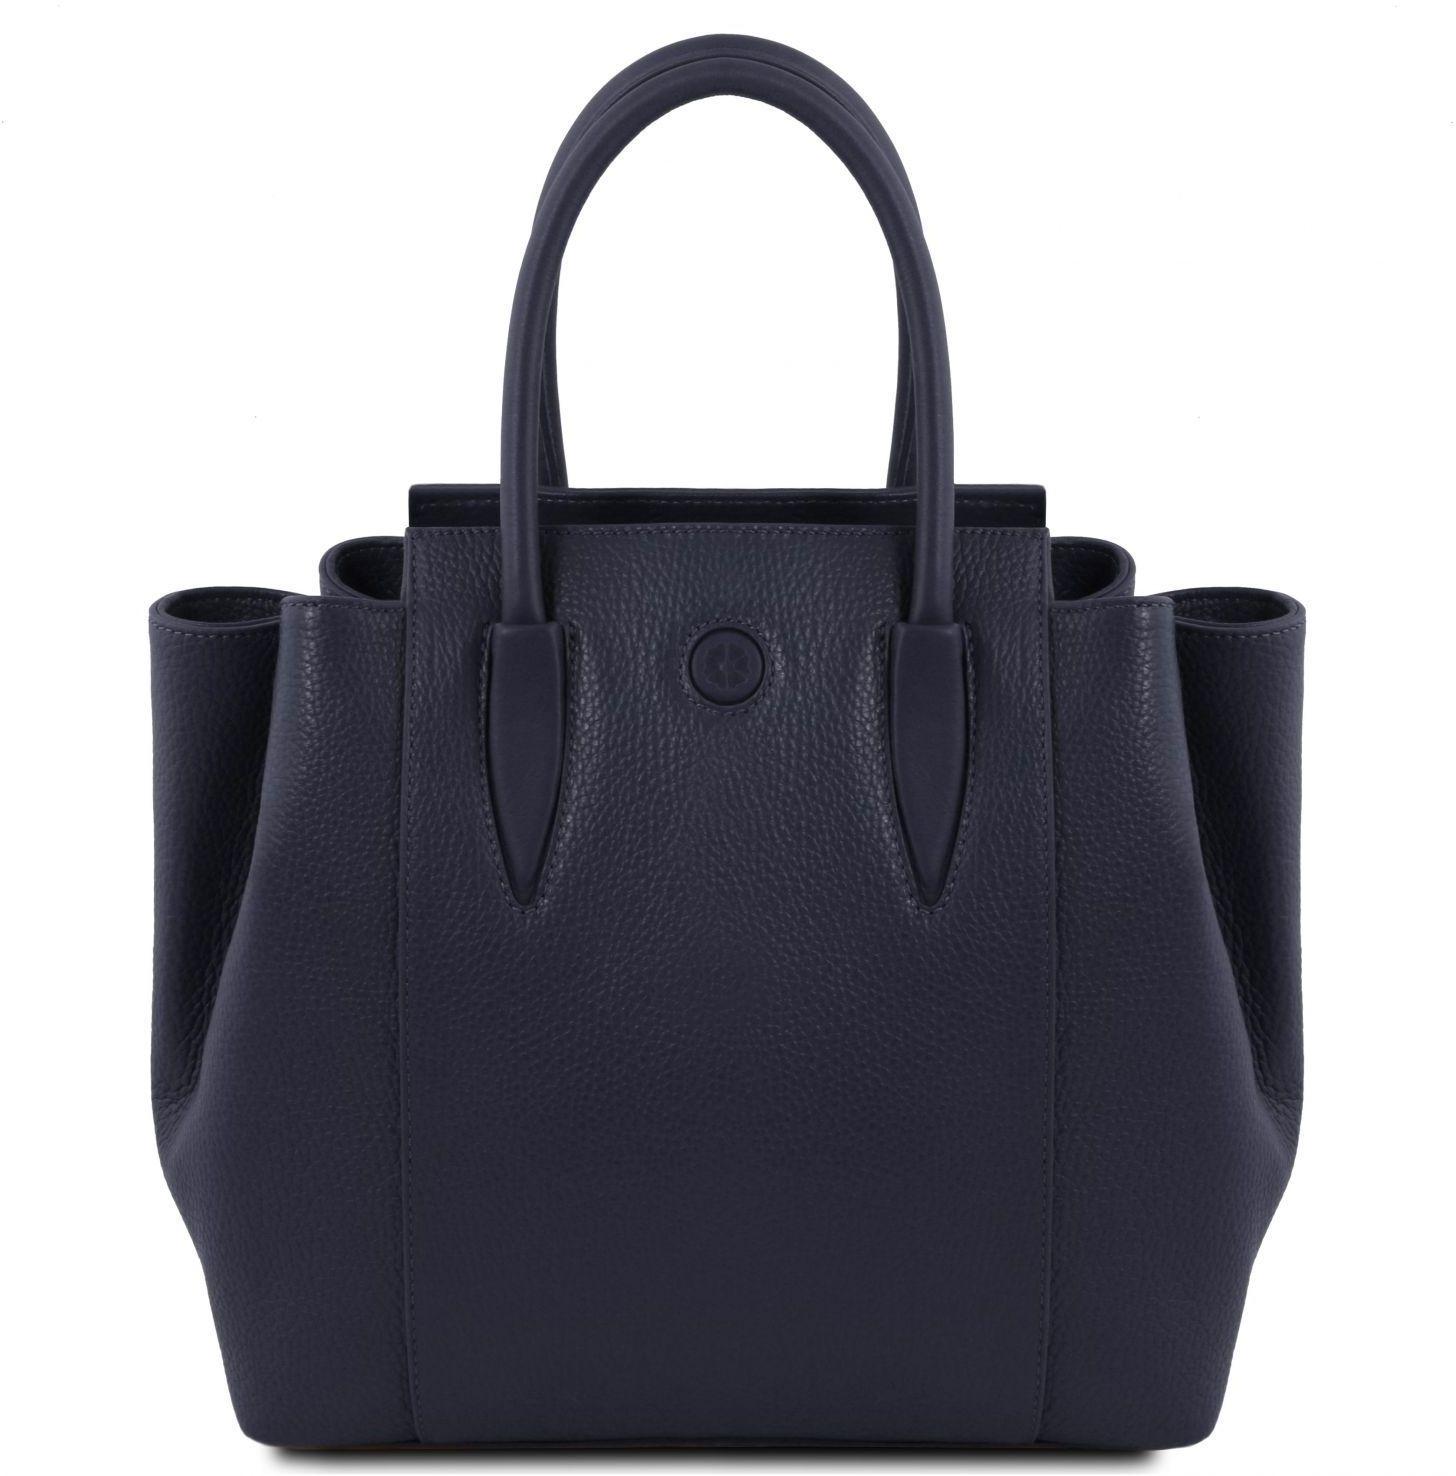 0df2dec6e8 Γυναικεία Τσάντα Δερμάτινη Tulipan Μπλε σκούρο Tuscany Leather